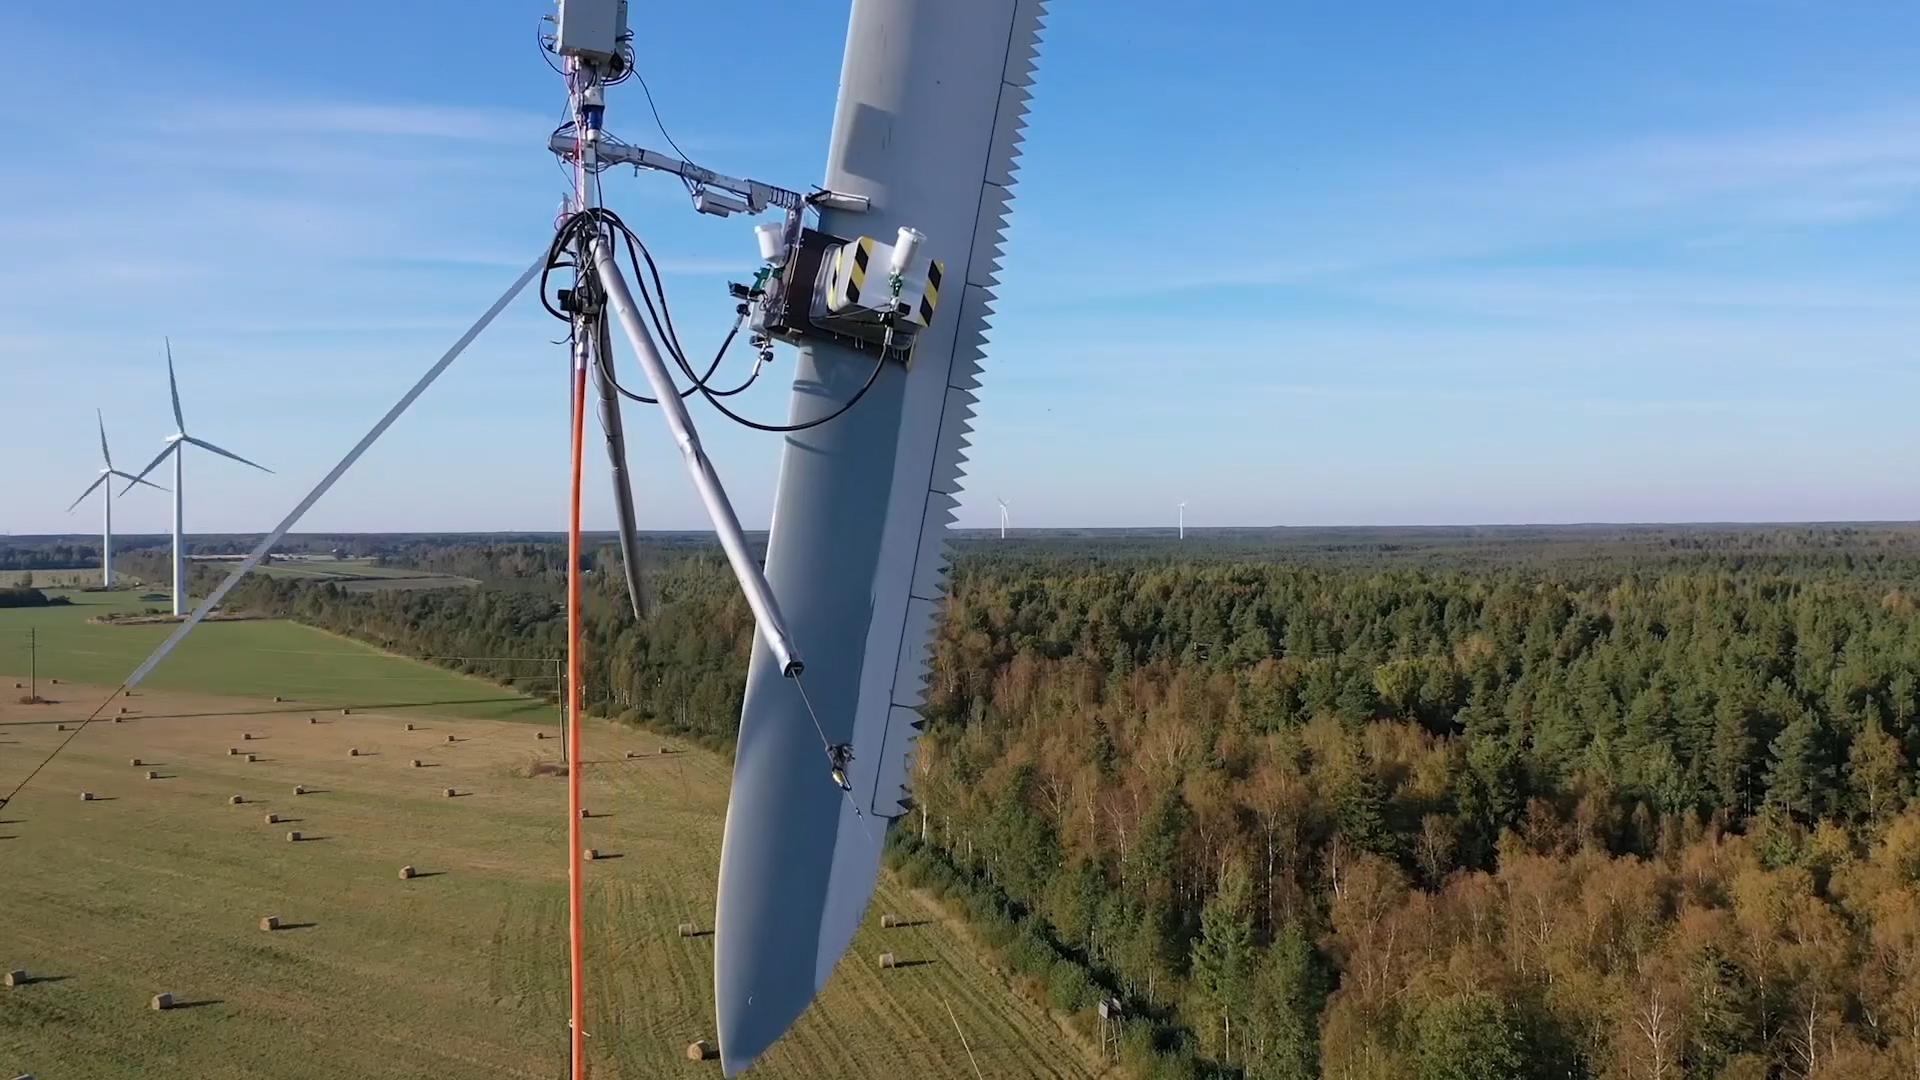 Aerones abandons industrial drones to focus on ground-based robotics as it raises $1.6M